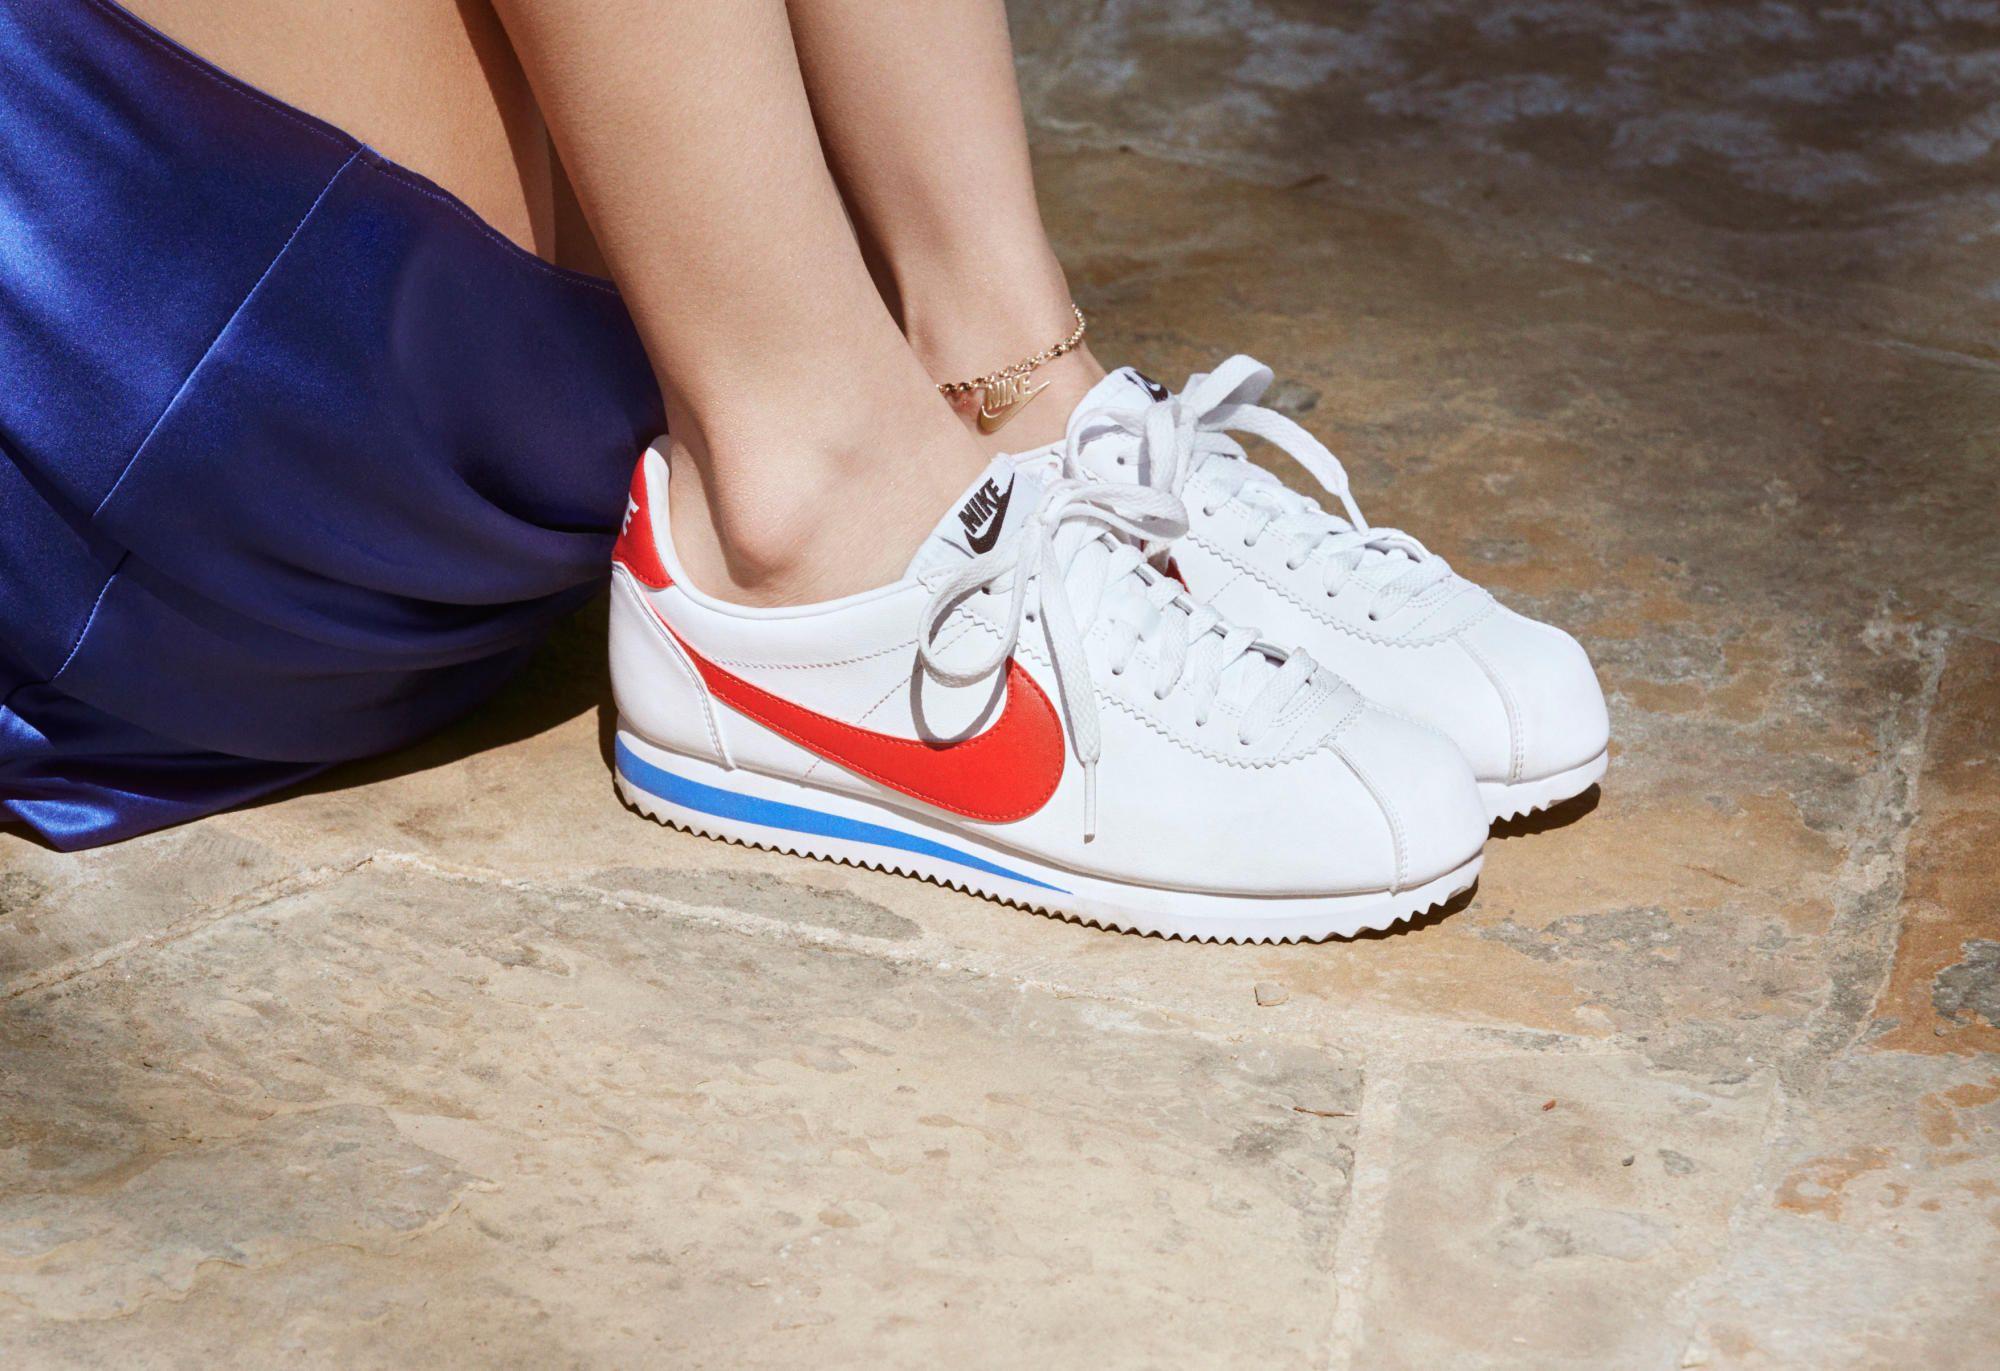 bd839597eaea0 Bella Hadid s New Nike Campaign Pays Homage to  70s-Era Farrah ...